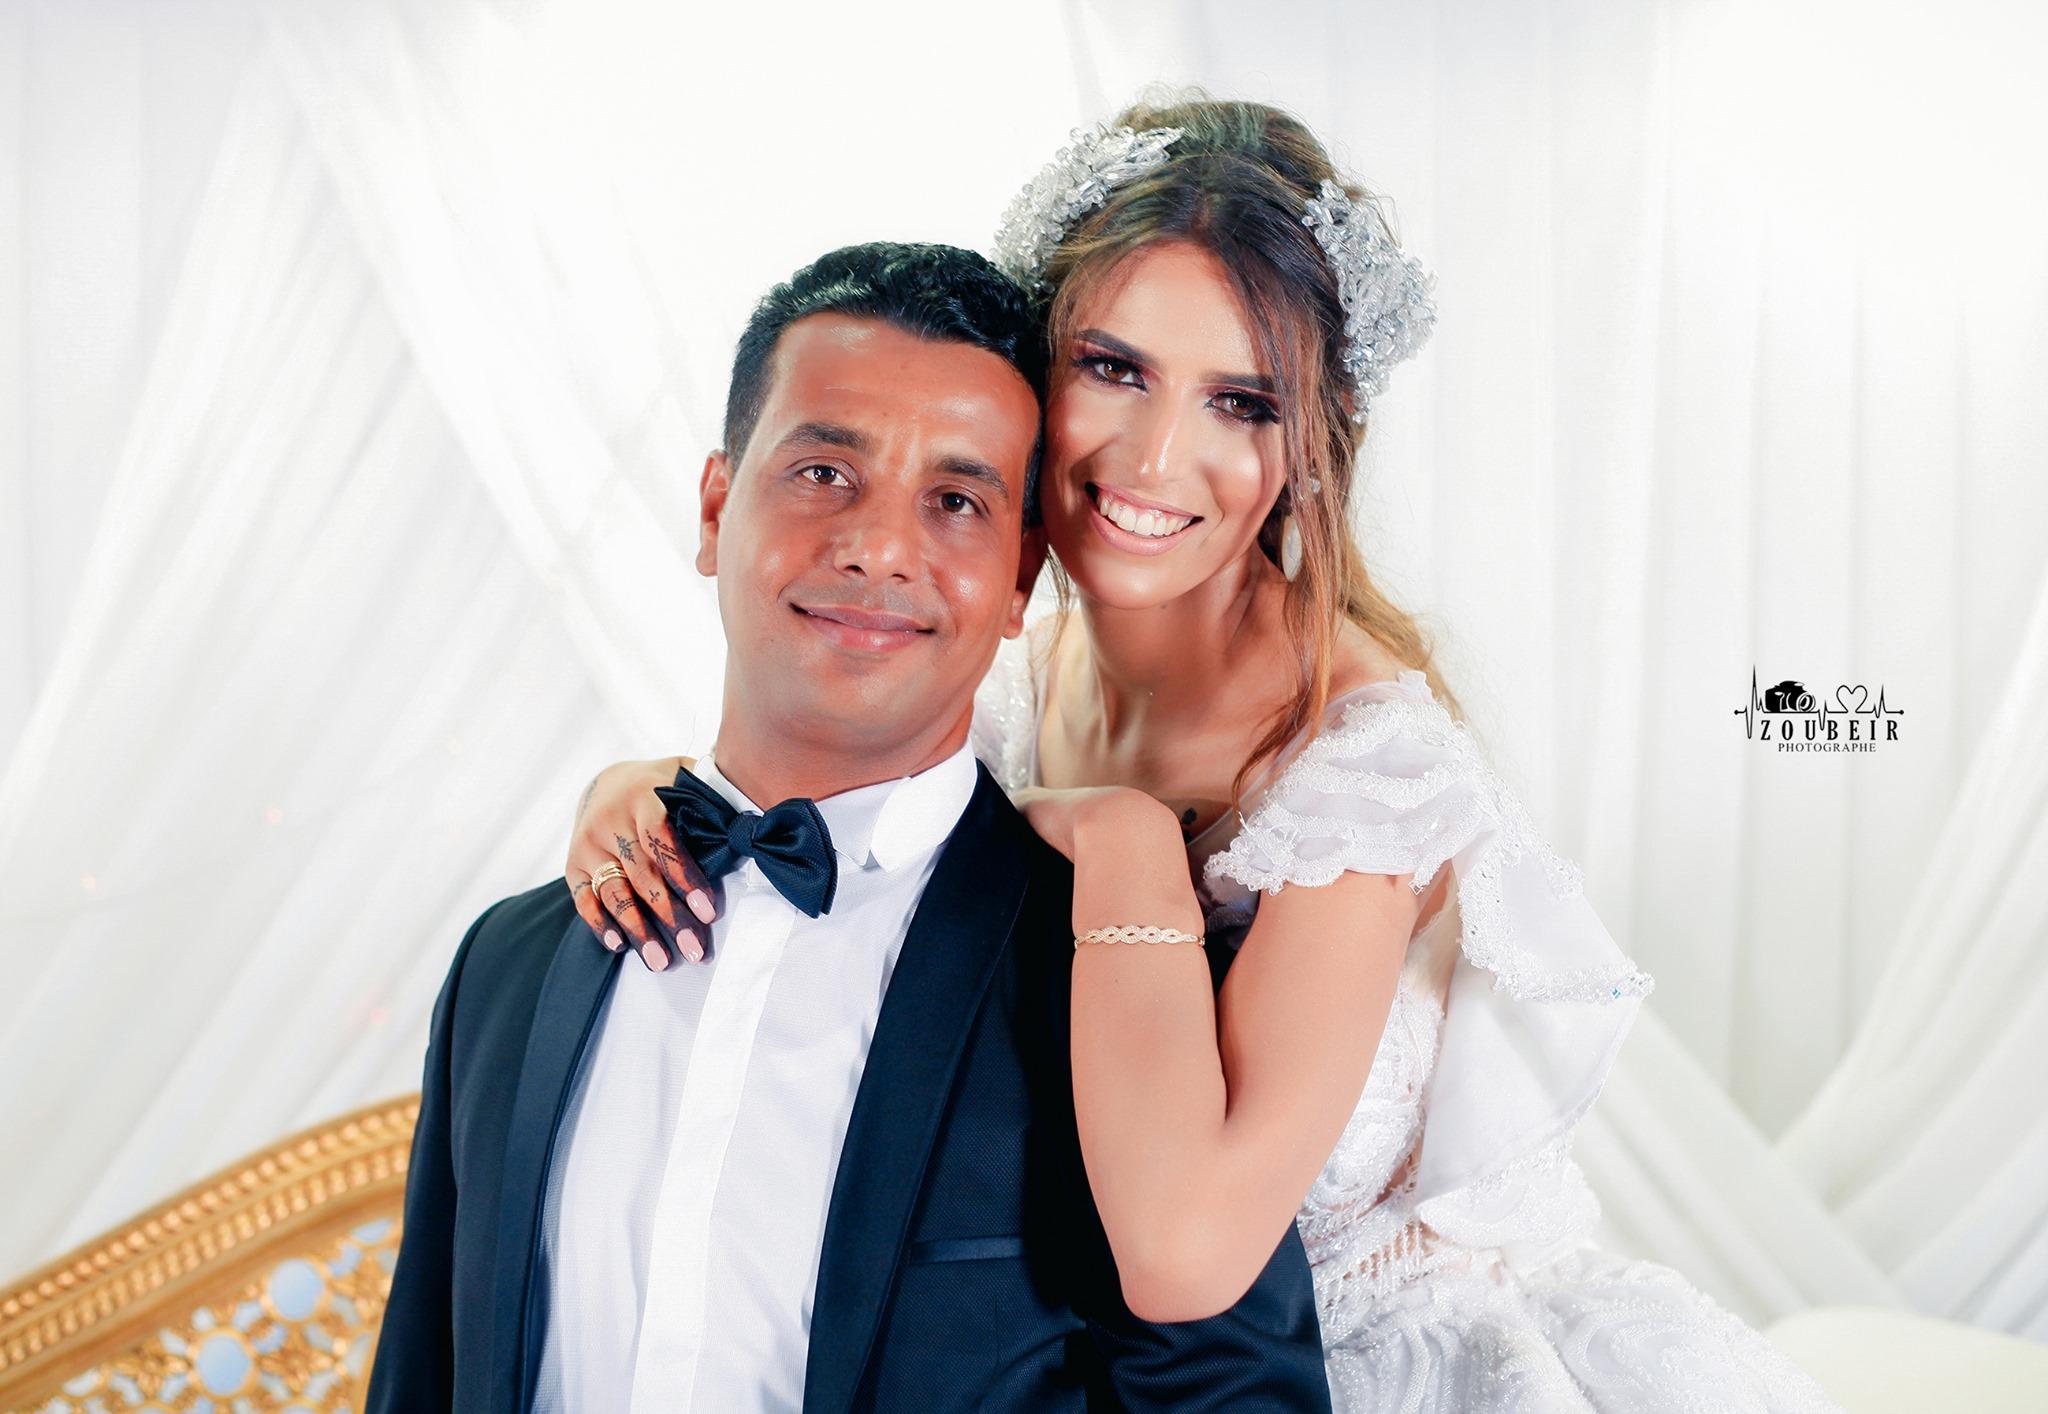 arij6_plus_belles_mariées_tunisiennes_183_2019